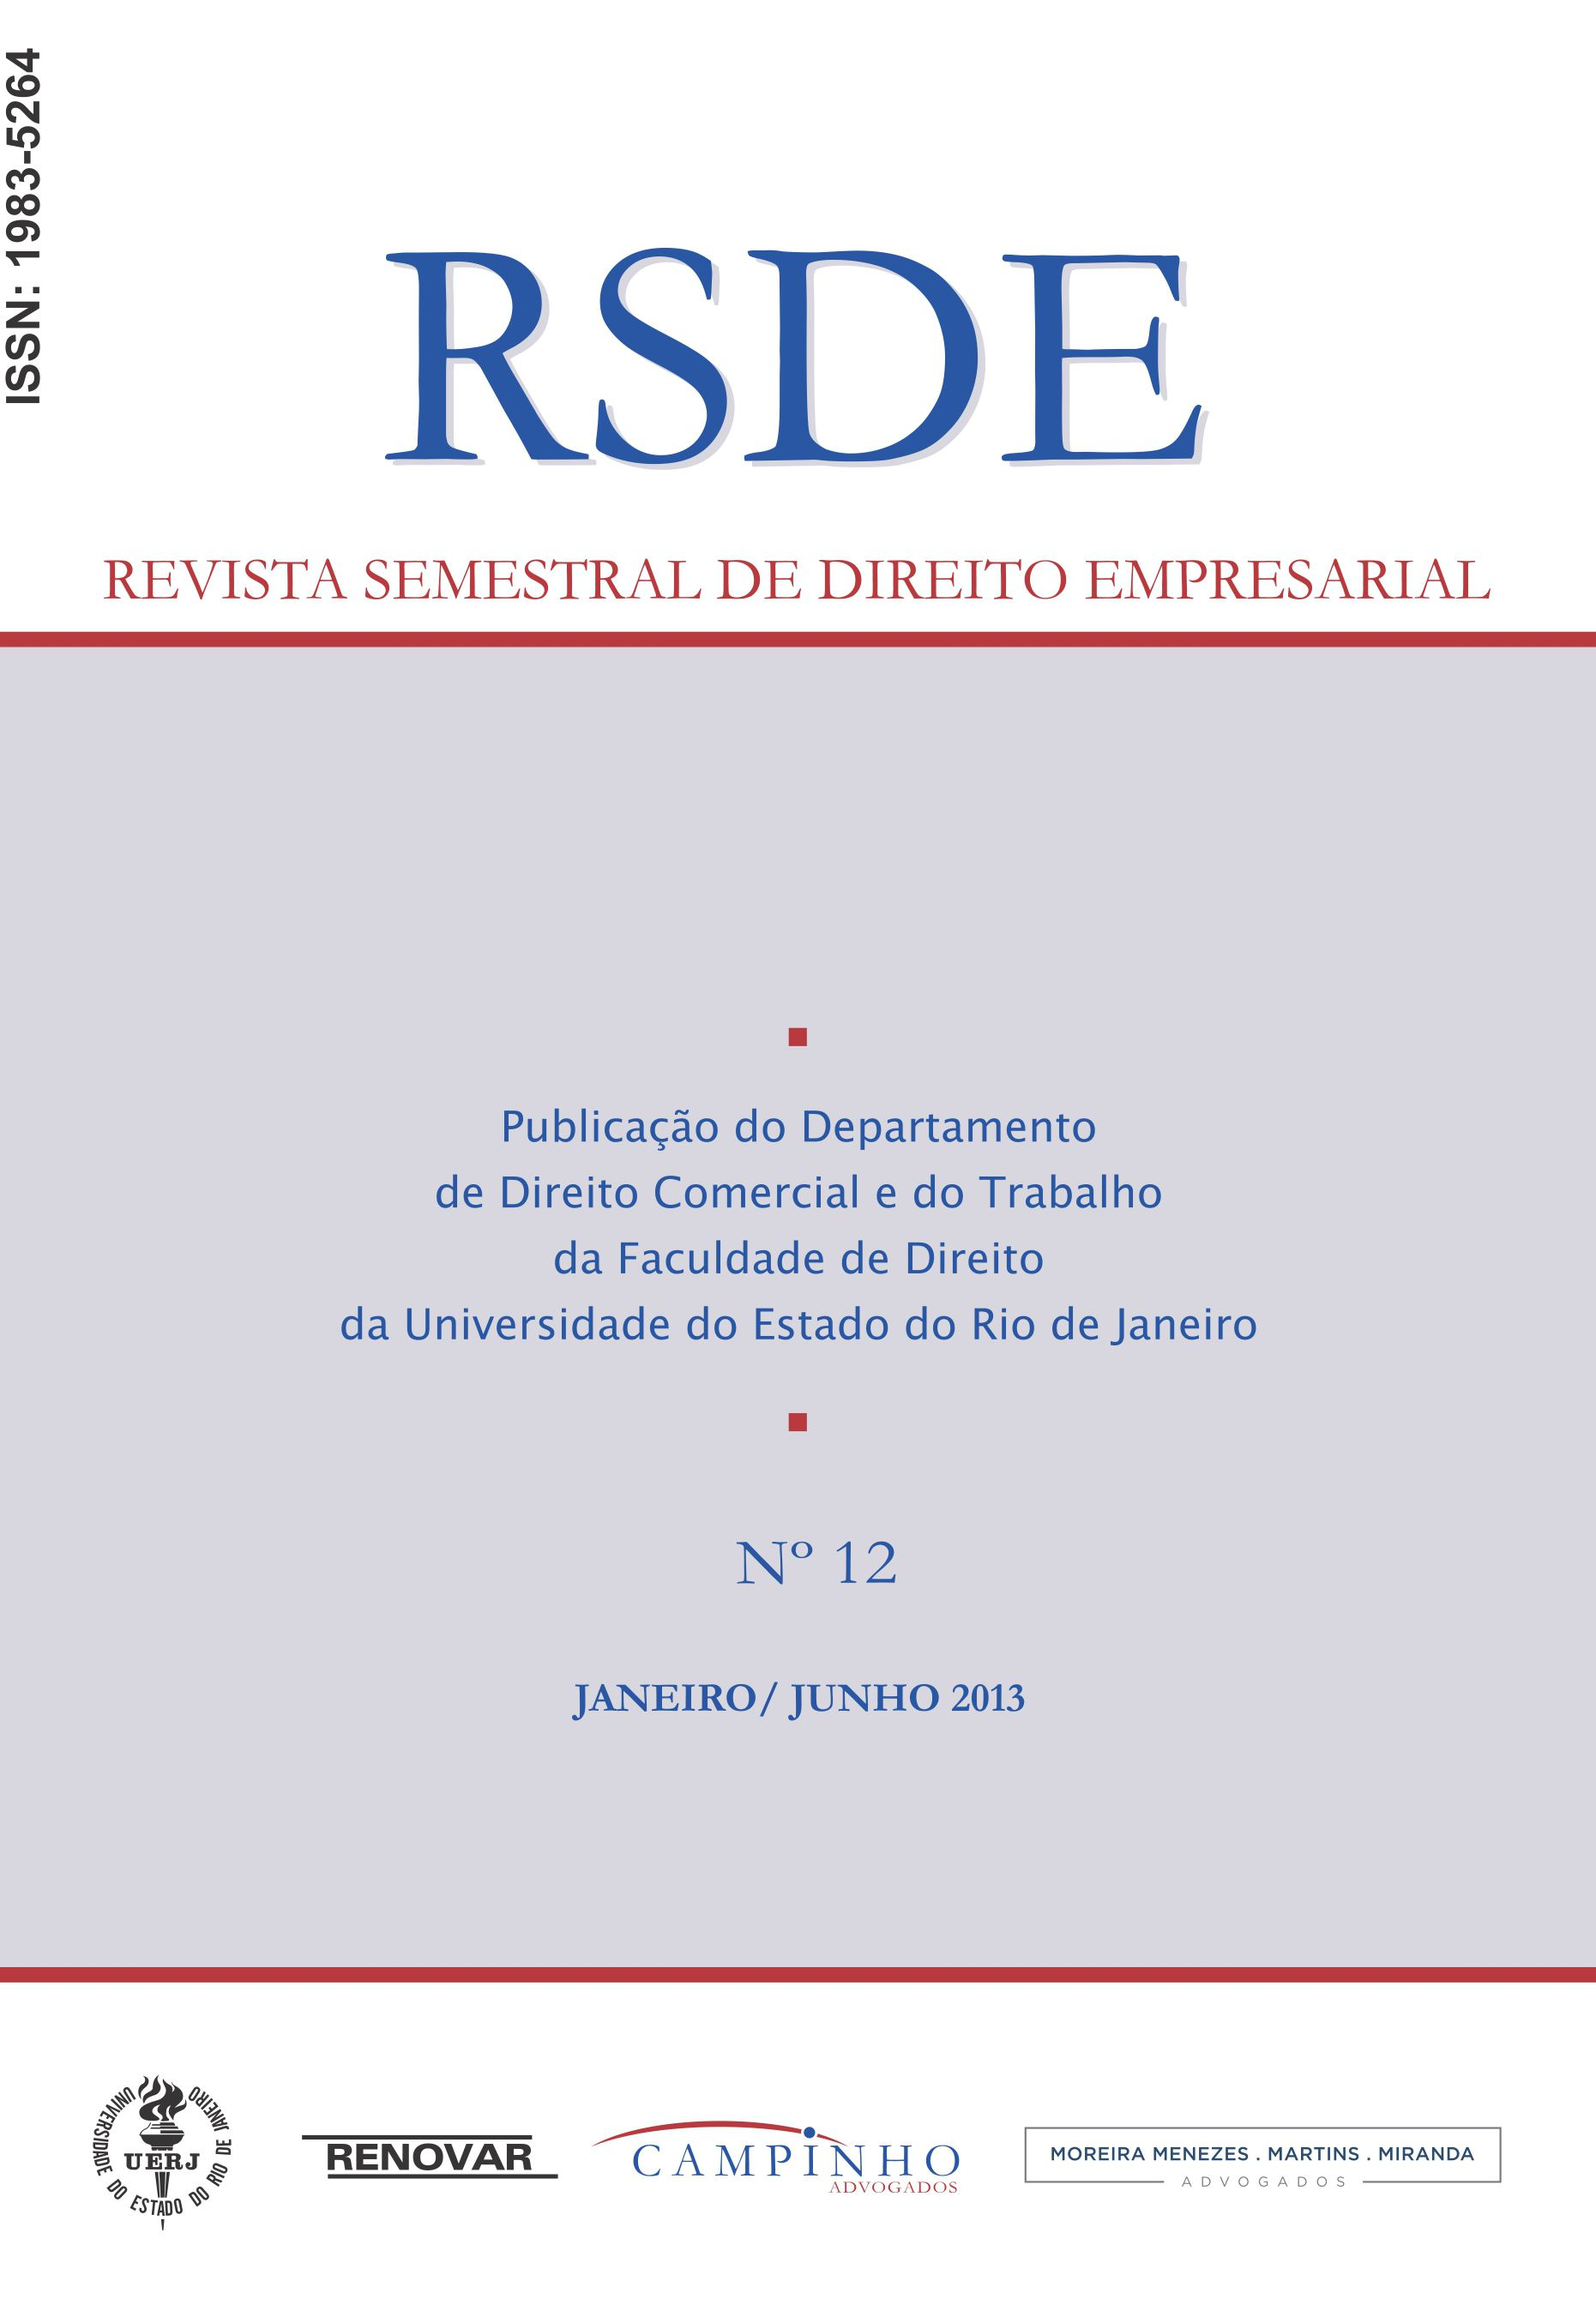 Capa_revista_rsde12